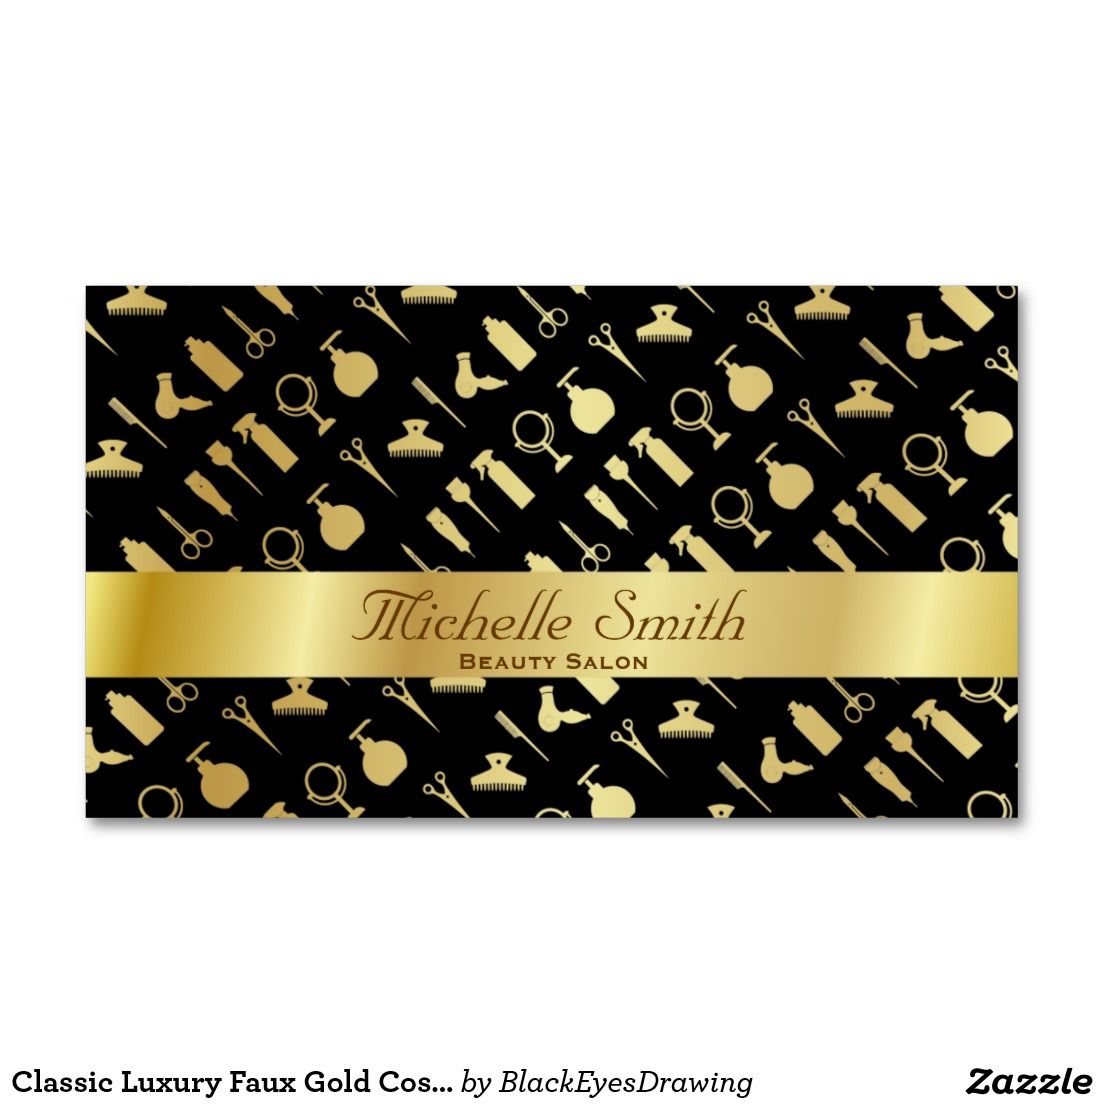 Classic Luxury Faux Gold Cosmetics Beauty Salon Business Card ...